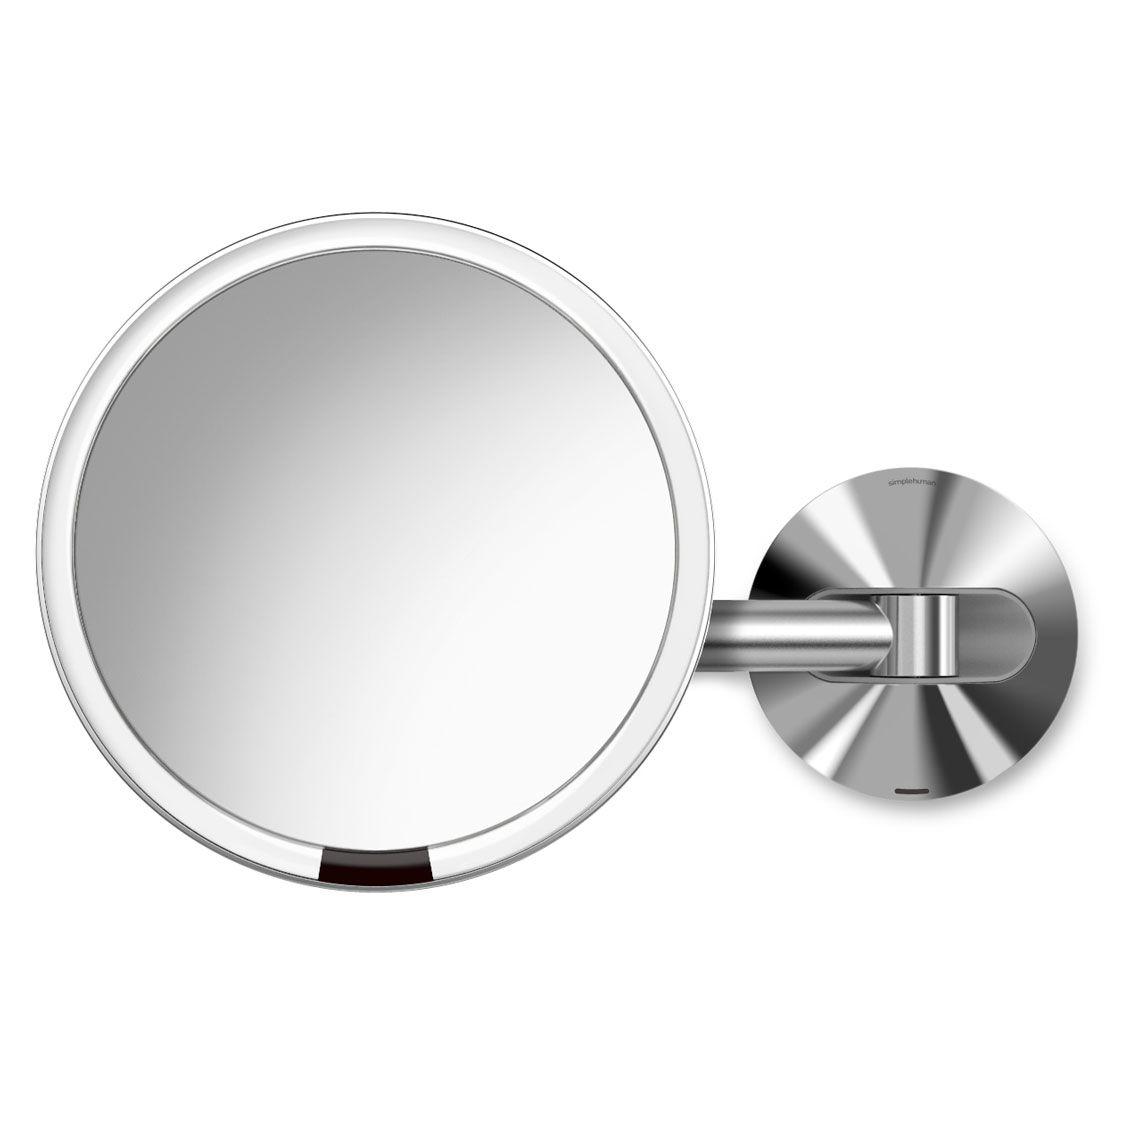 Simplehuman 8 Inch Wall Mount Sensor Mirror Polished